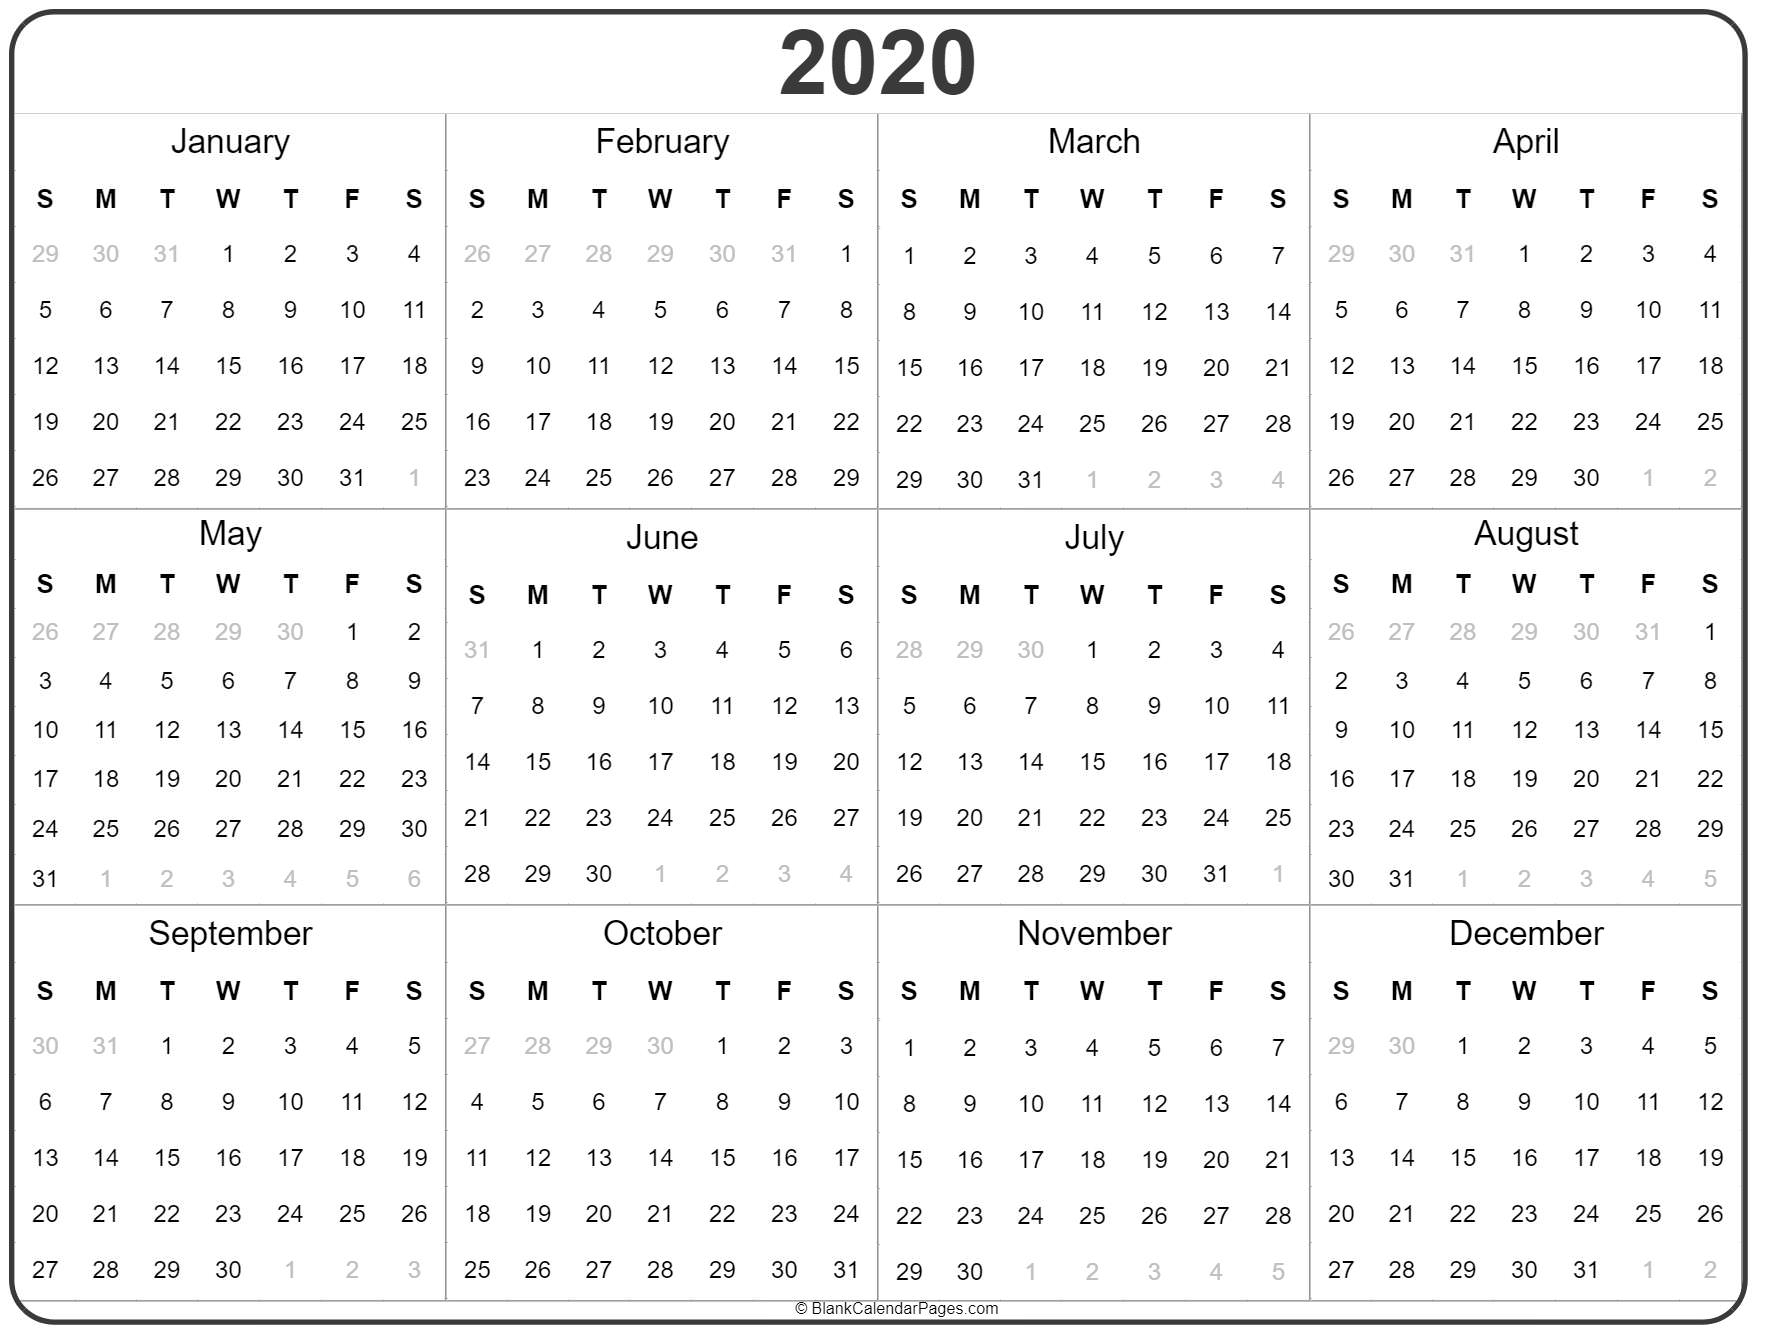 Print Yearly Calendar 2020 - Wpa.wpart.co